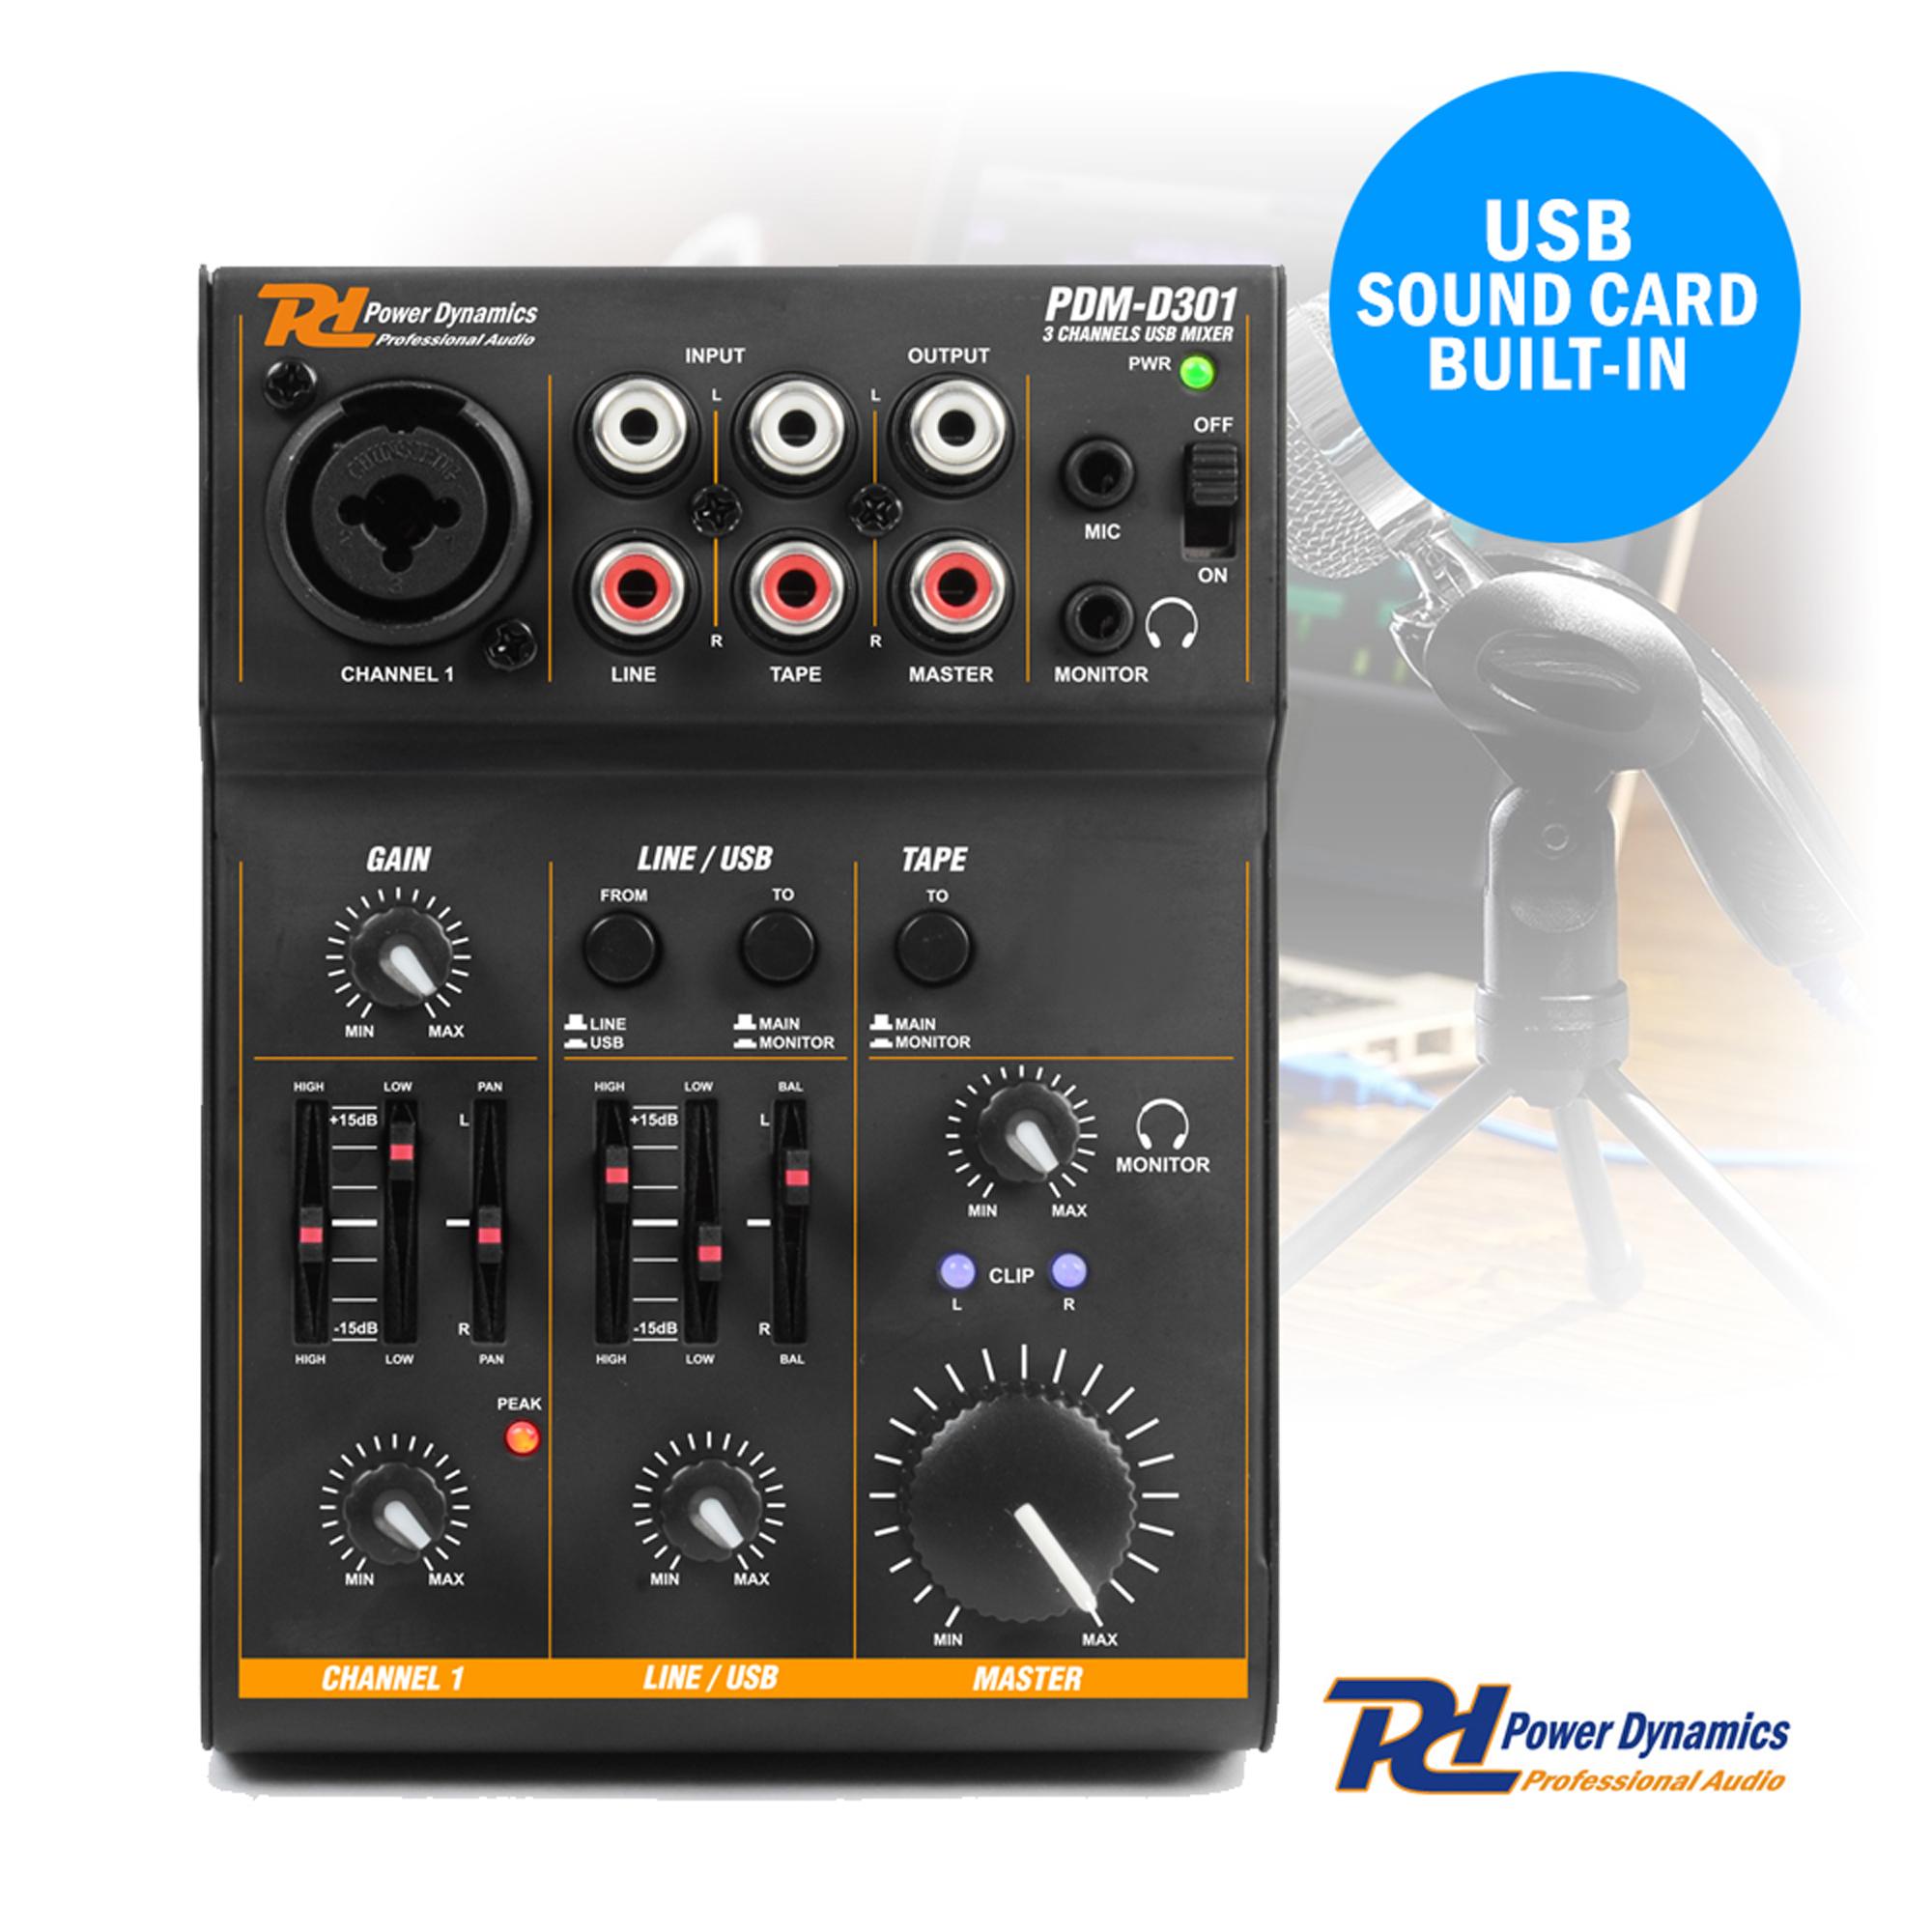 podcast desktop studio microphone and 3 channel usb live mixer recording set. Black Bedroom Furniture Sets. Home Design Ideas